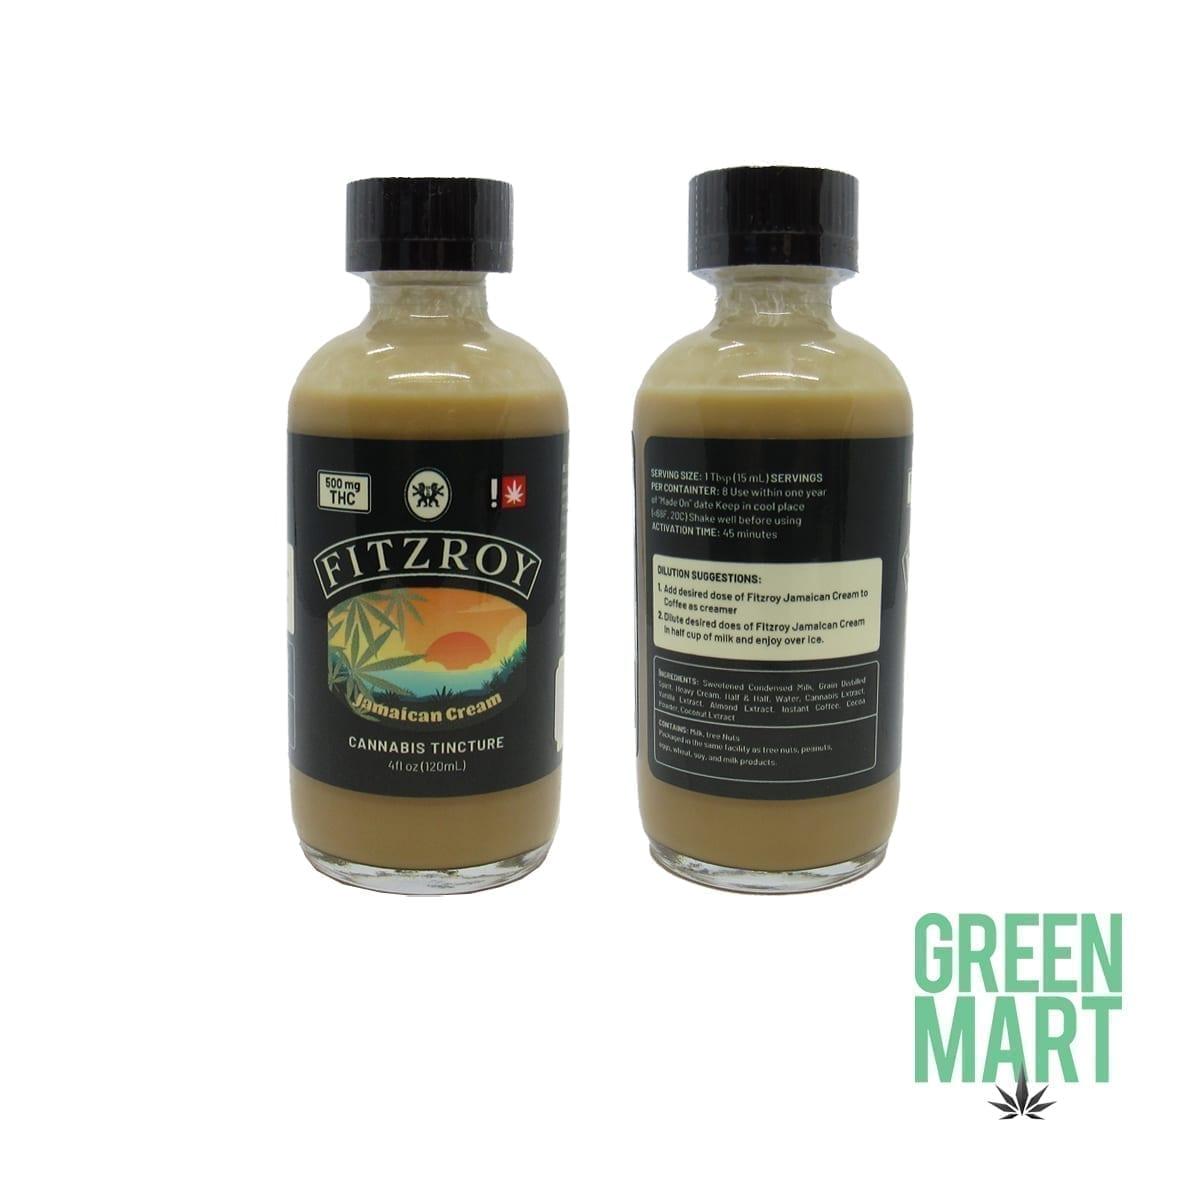 Fitzroy - Jamaican Cream Cannabis Tincture